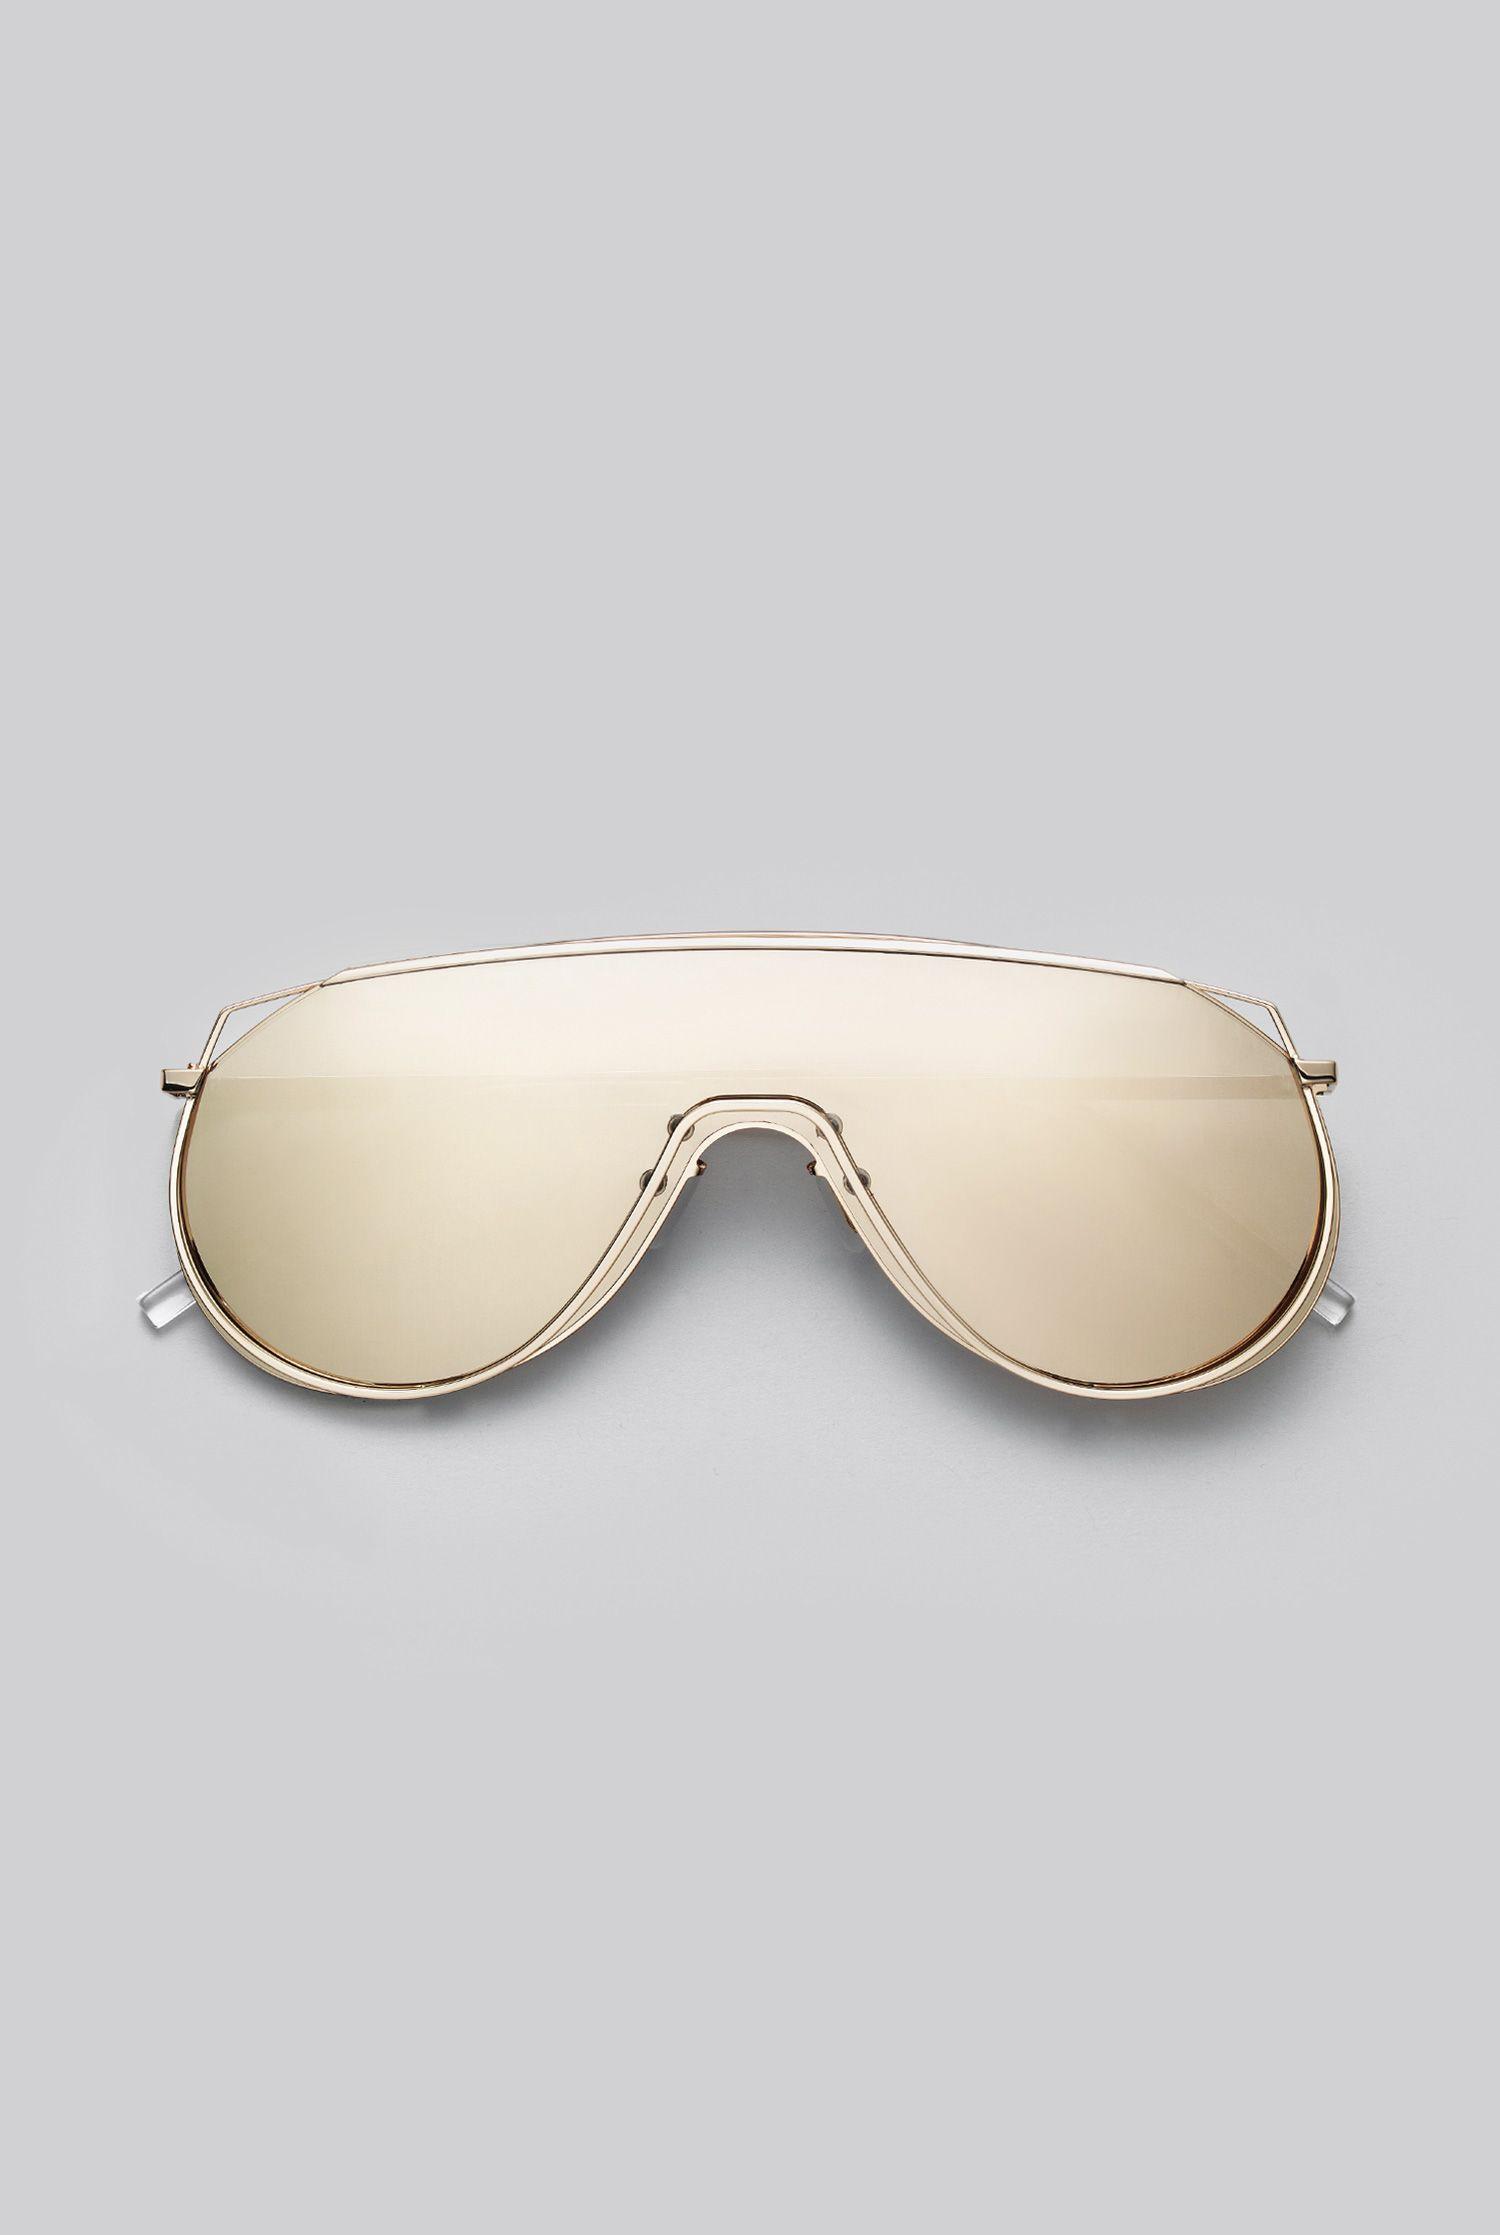 b541146b7e5f GENTLE MONSTER - AFIX 032(14M). AFIX 032(14M)Stainless steel frame in gold